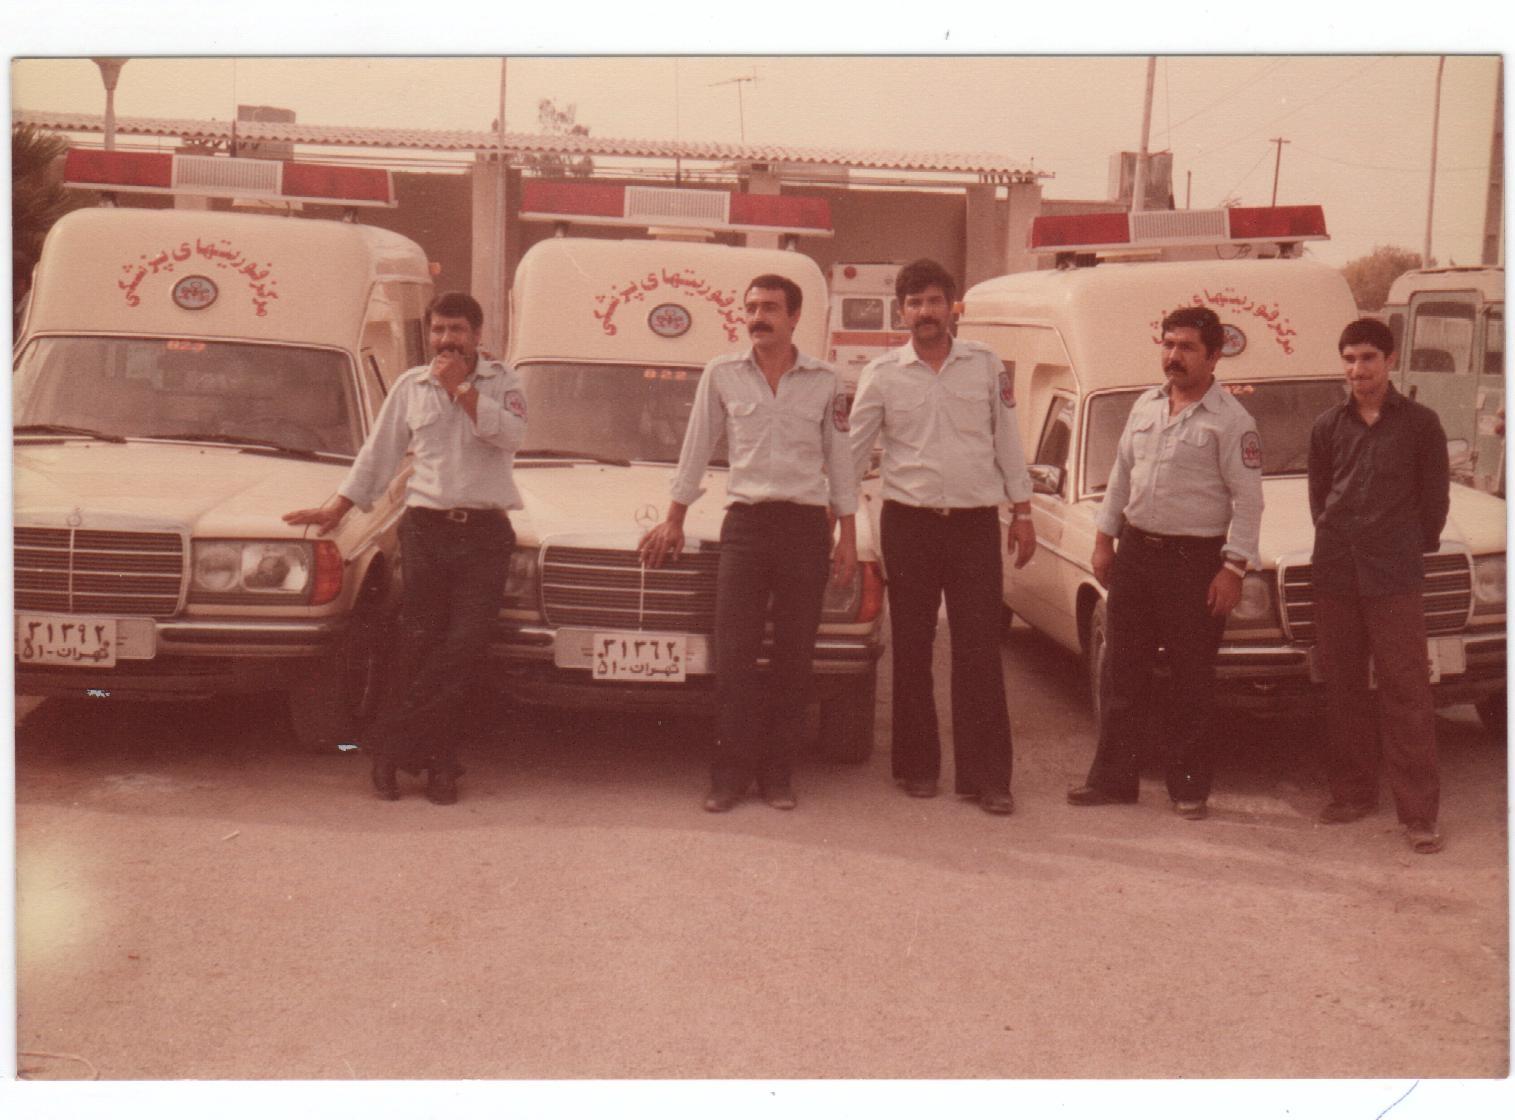 13990619001083 Test NewPhotoFree - 30 درصد تماسهای اورژانس تهران مزاحمت تلفنی است/47 هزار تماس در یک شبانه روز/ ابتلای 282 تکنسین اورژانس به کووید 19